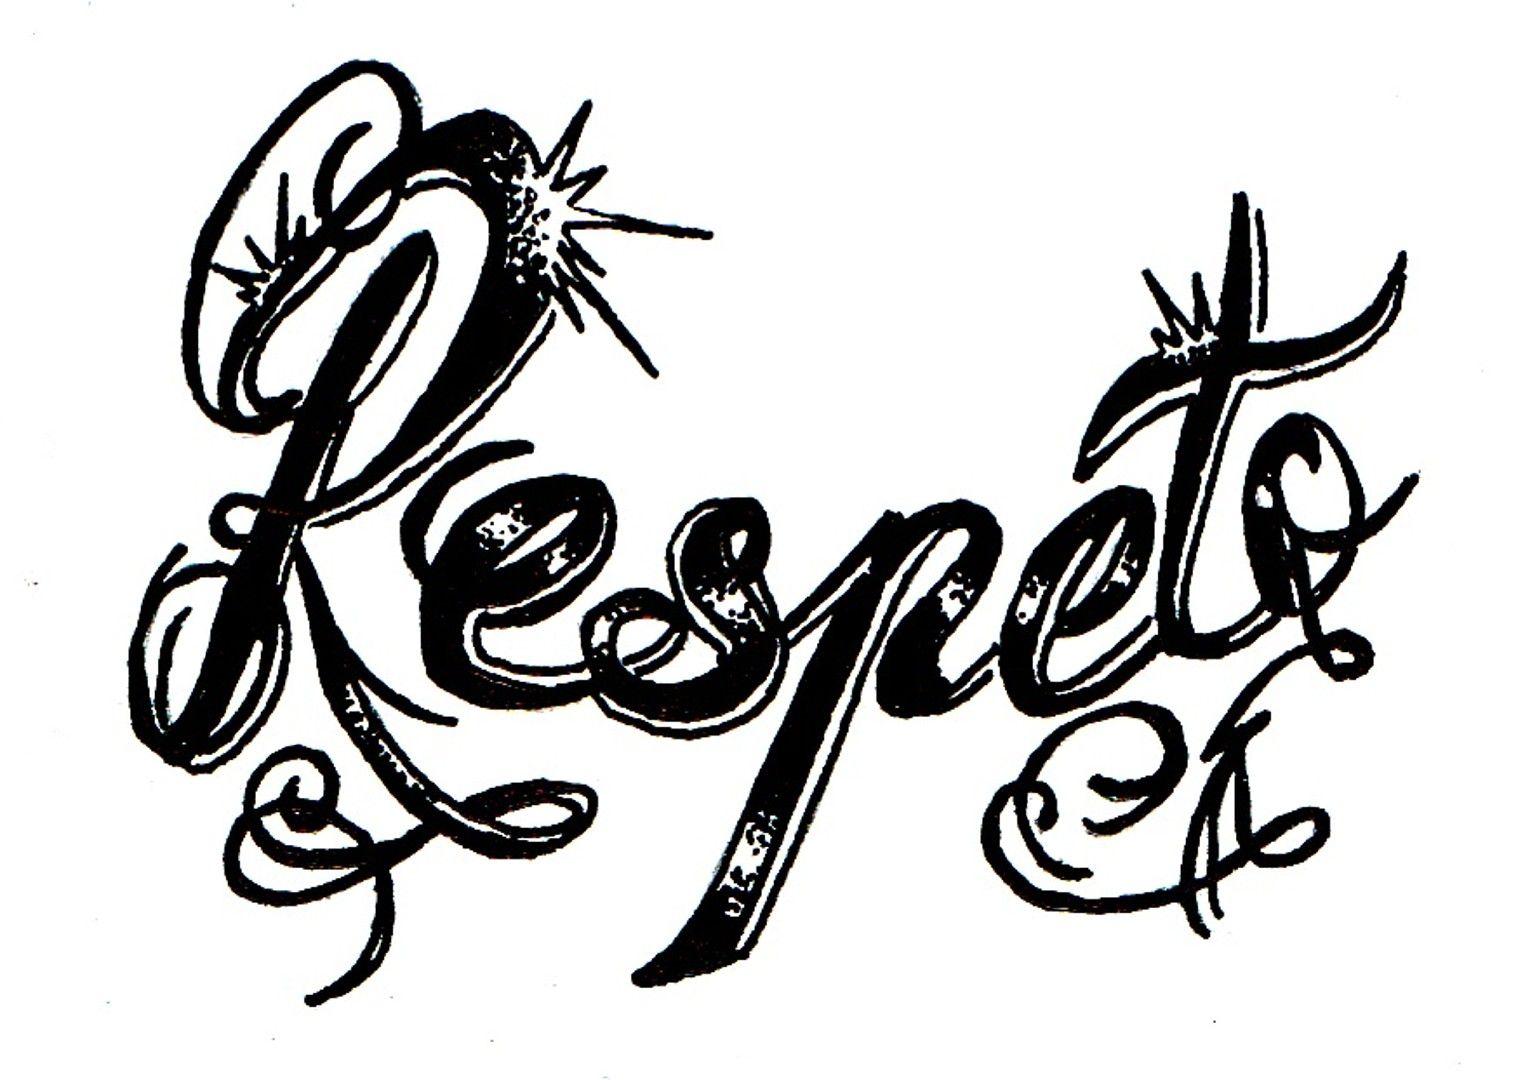 El Respeto Imagenes Respeto Jpg 1536 1080 Respeto Imagenes Valor Respeto Para Ninos Respeto